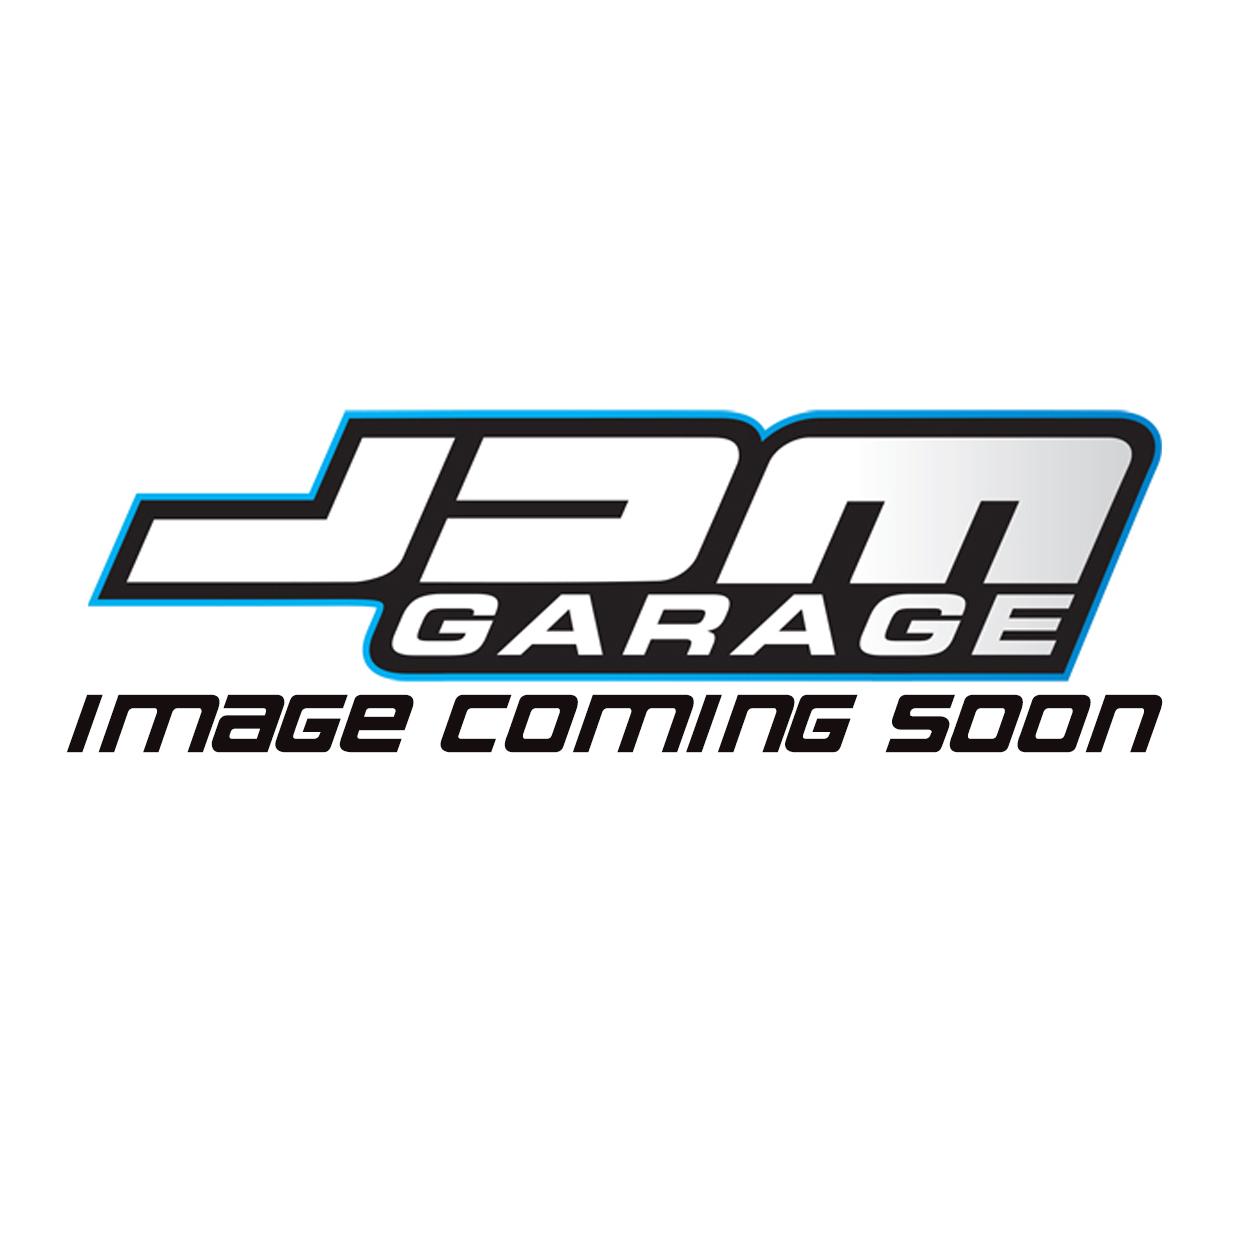 Facet Blue Top Cylindrical Fuel Pump Kit - Petrol & Diesel